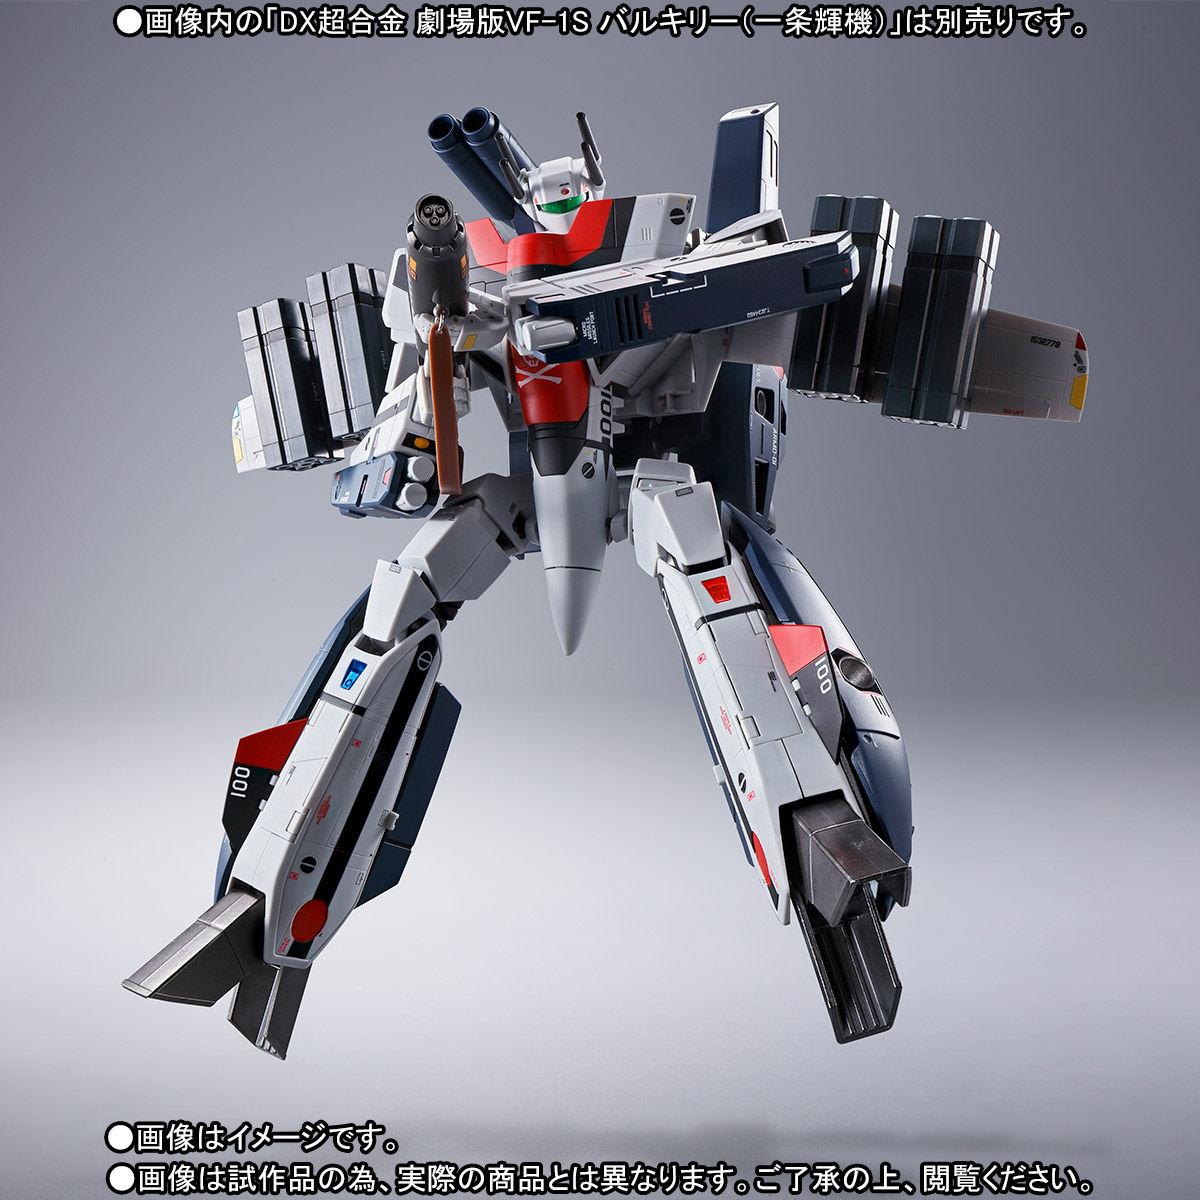 DX超合金『劇場版VF-1対応ストライク/スーパーパーツセット』拡張パーツ-007